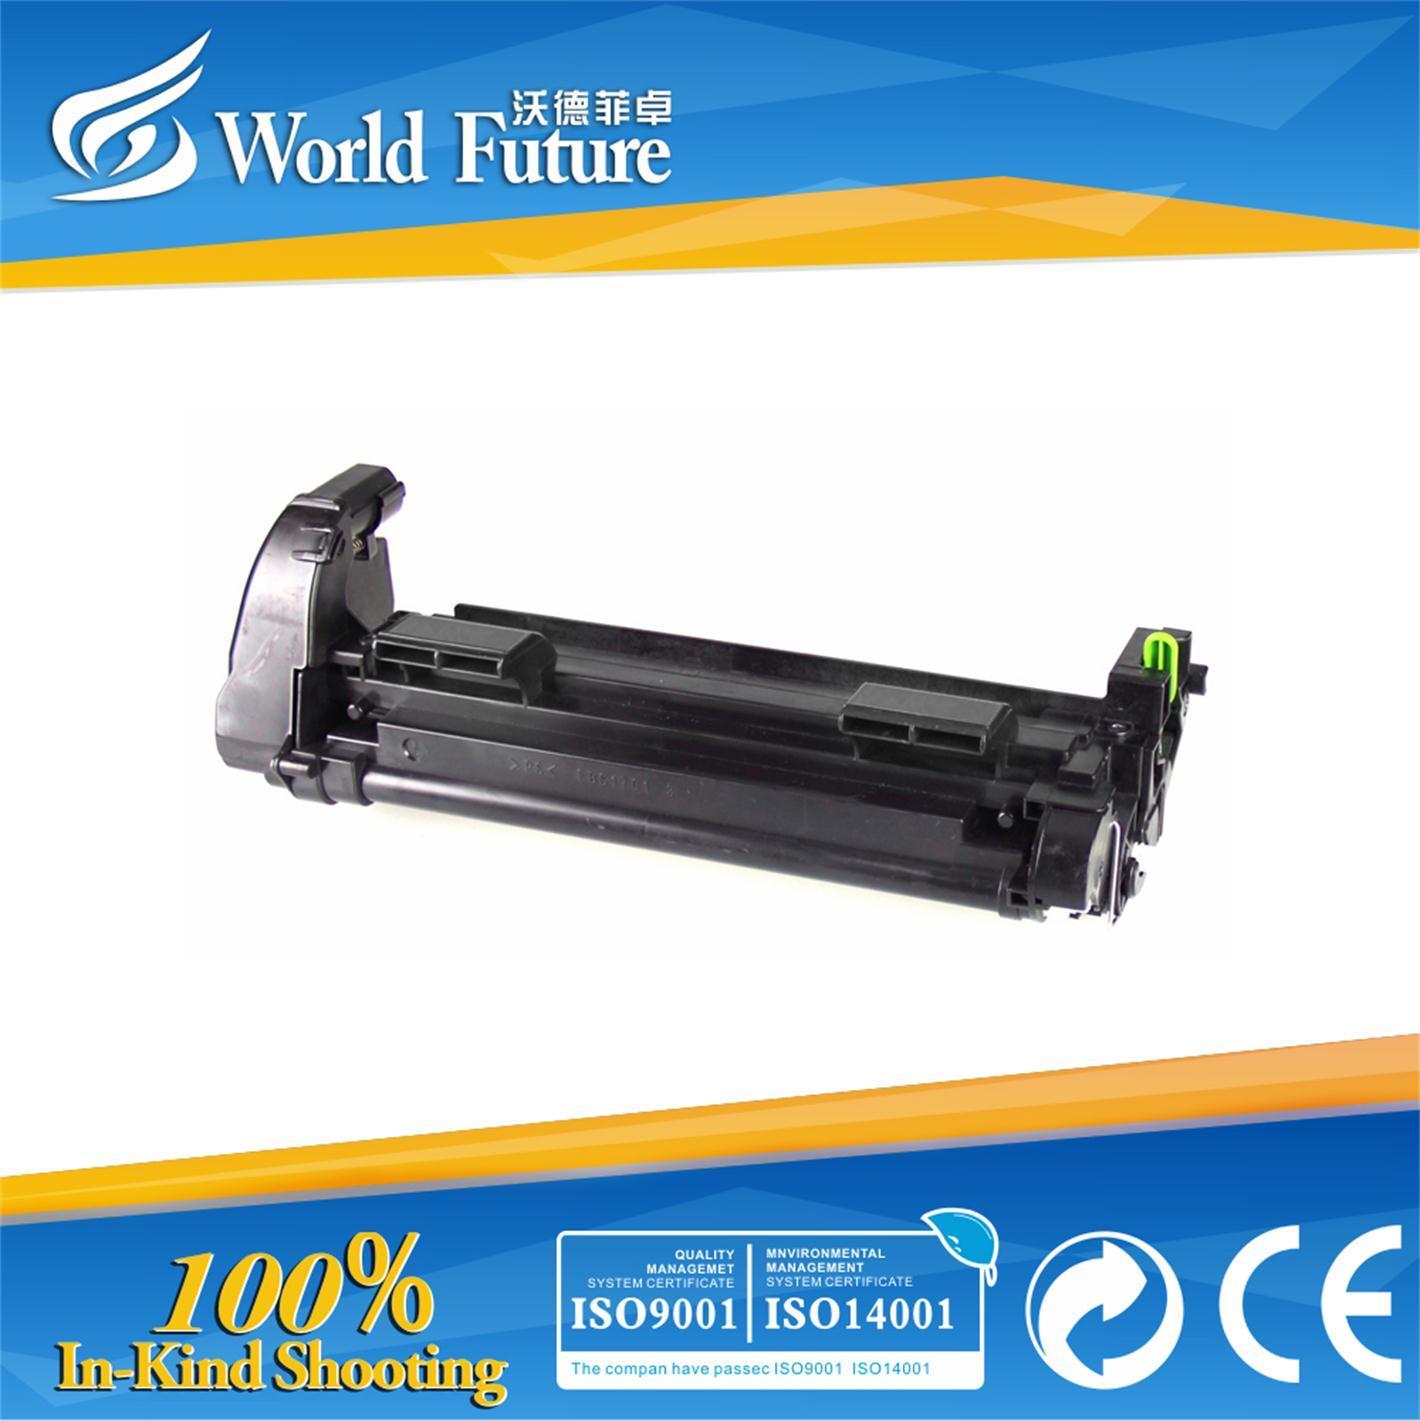 China Remanufacured Laser Printer Toner Cartridge for Panasonic (UG3220)  (Drum) - China Laser Toner Cartridge, Ug3220